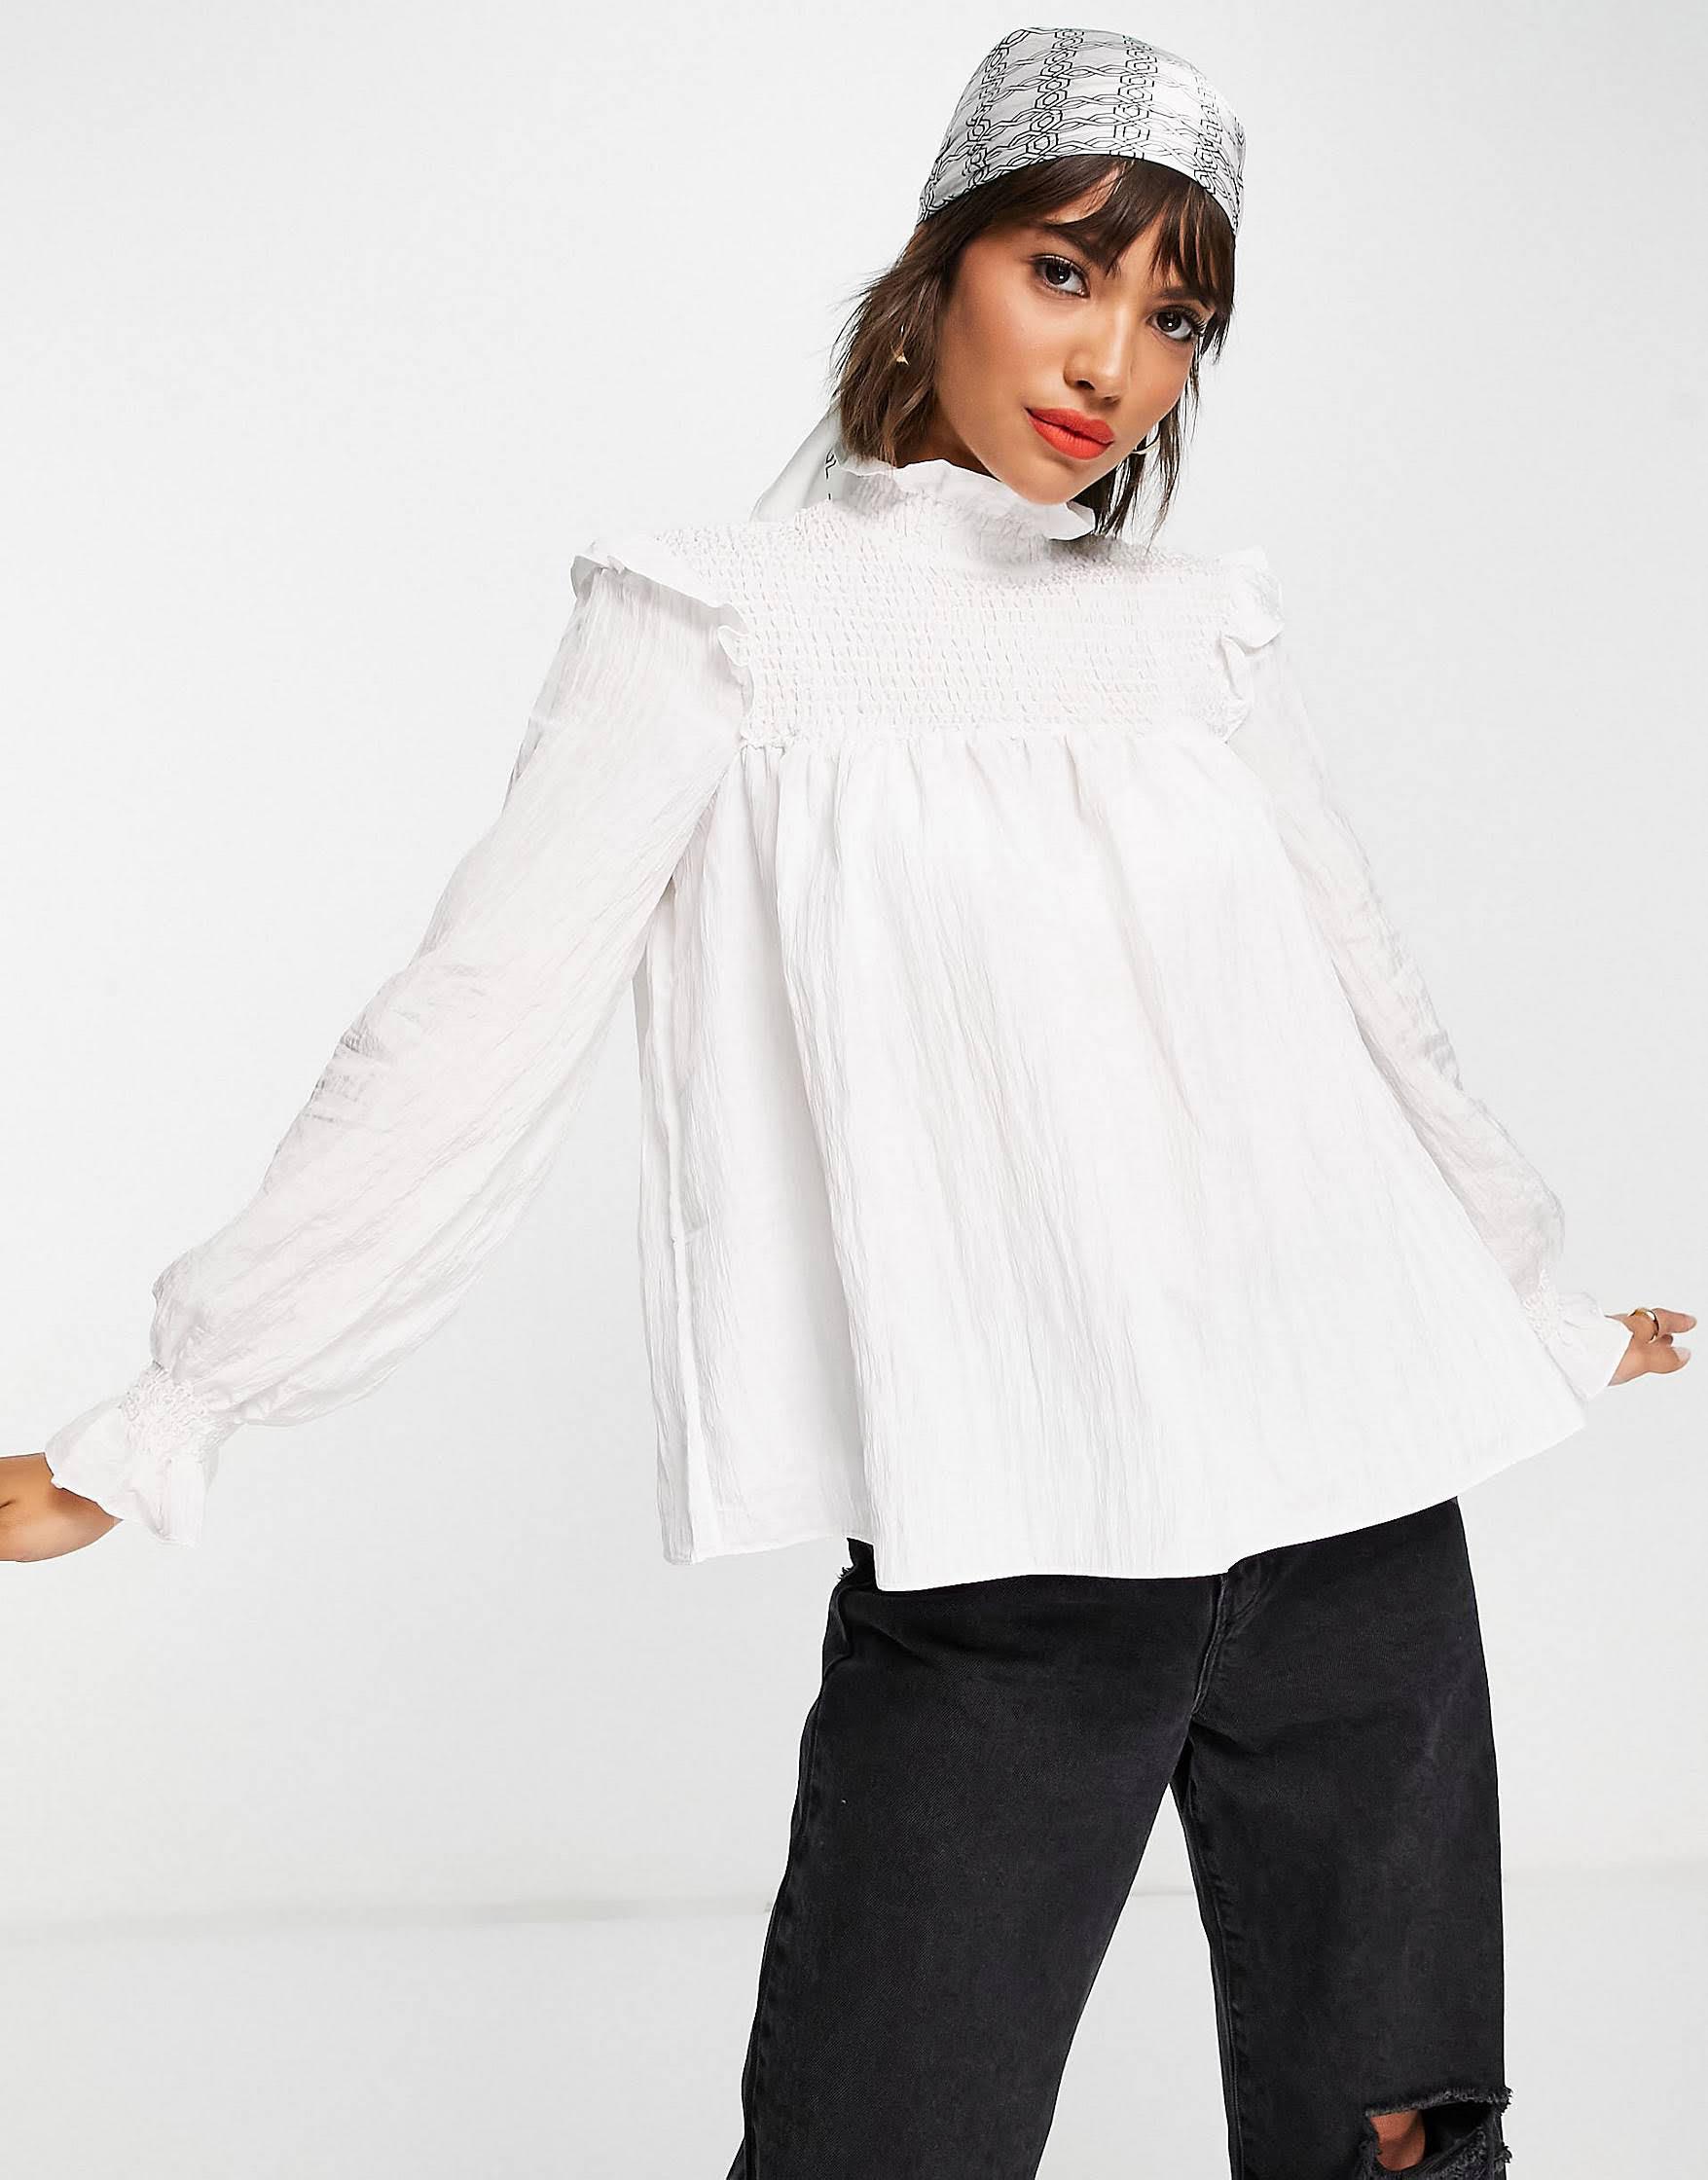 Blusa blanco nítido amplia con cuello alto y mangas abullonadas Boza de French Connection